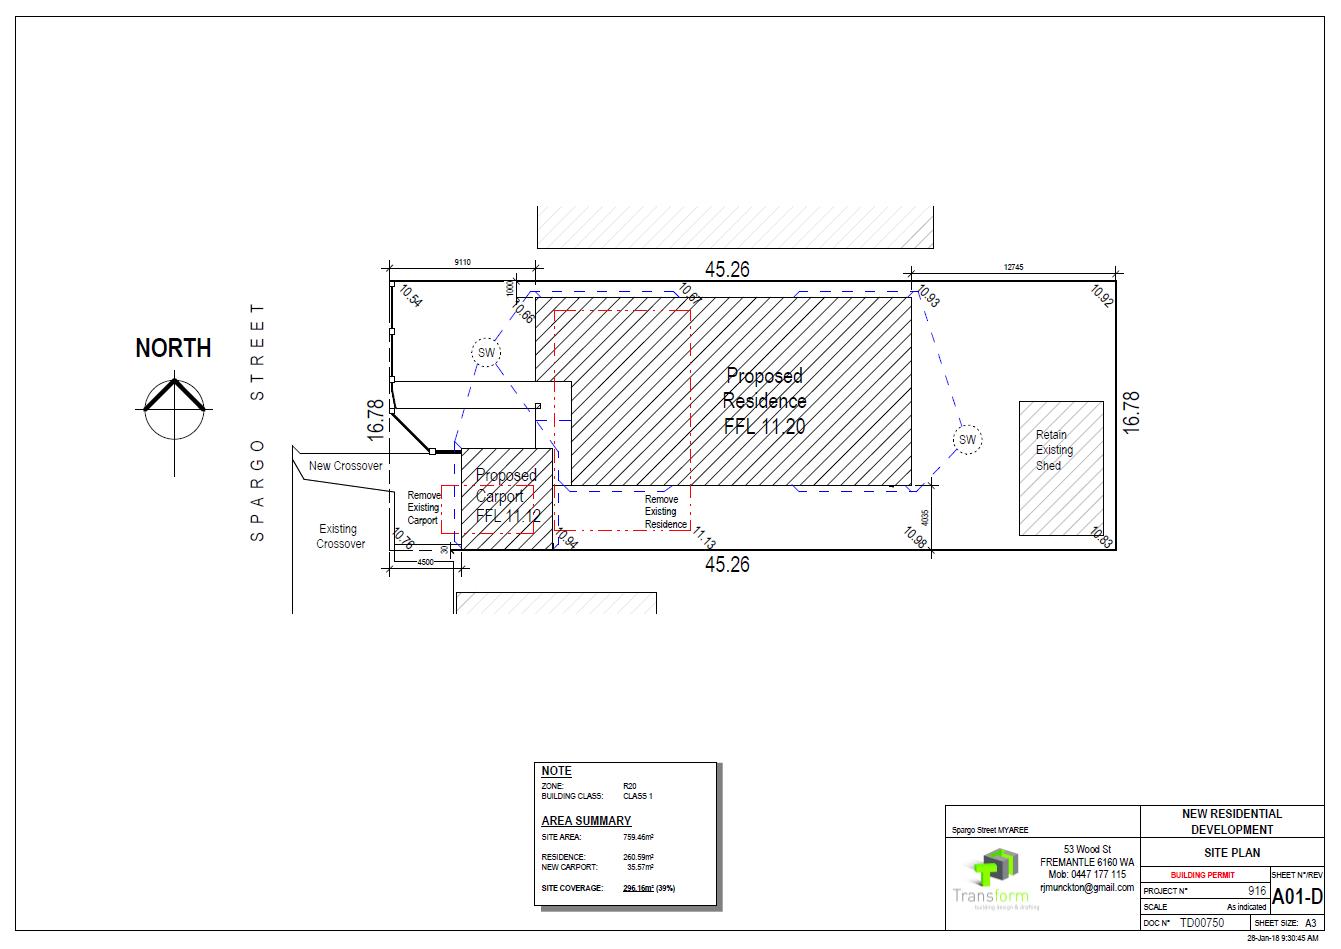 2. Site Plan (7)